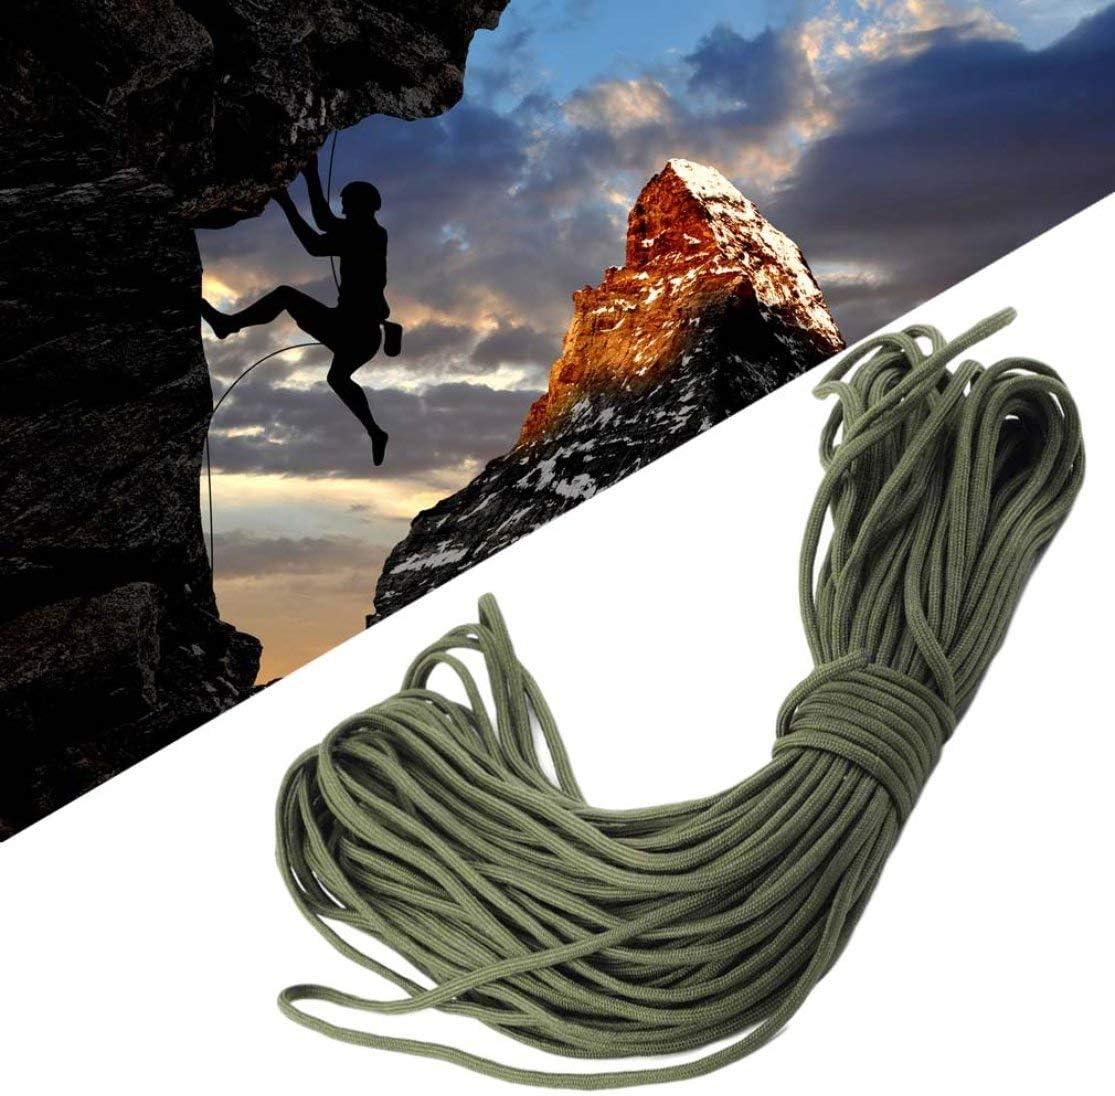 Kaemma 10 Farben 550 Fallschirmschnur Lanyard Seil Mil Spec Typ III 7 Core Strang 101FT Klettern Camping Survival Equipment